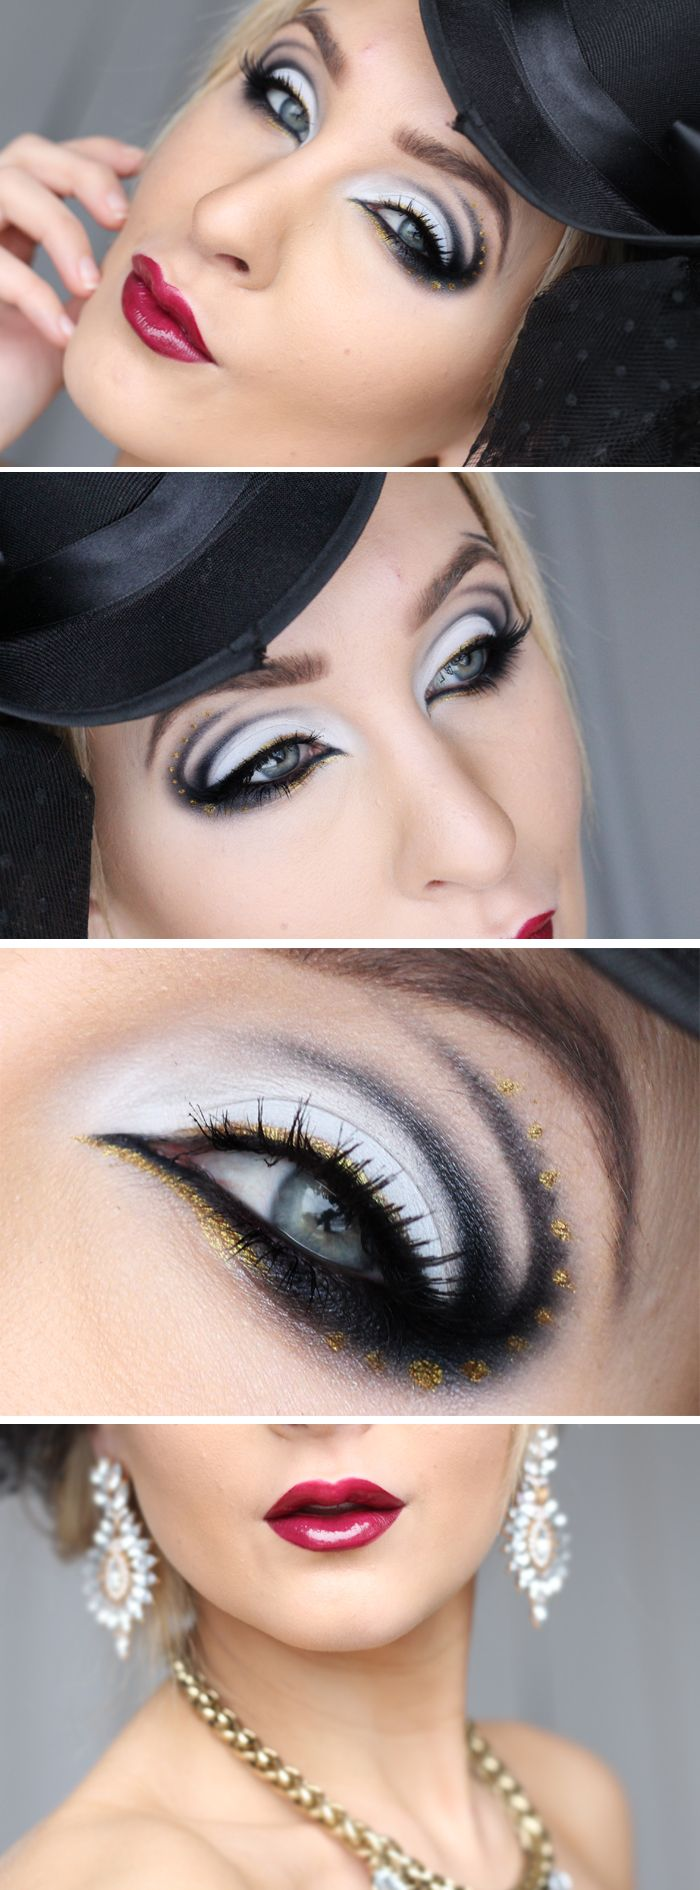 Dagens makeup – CABARET | Helen Torsgården – Hiilens sminkblogg